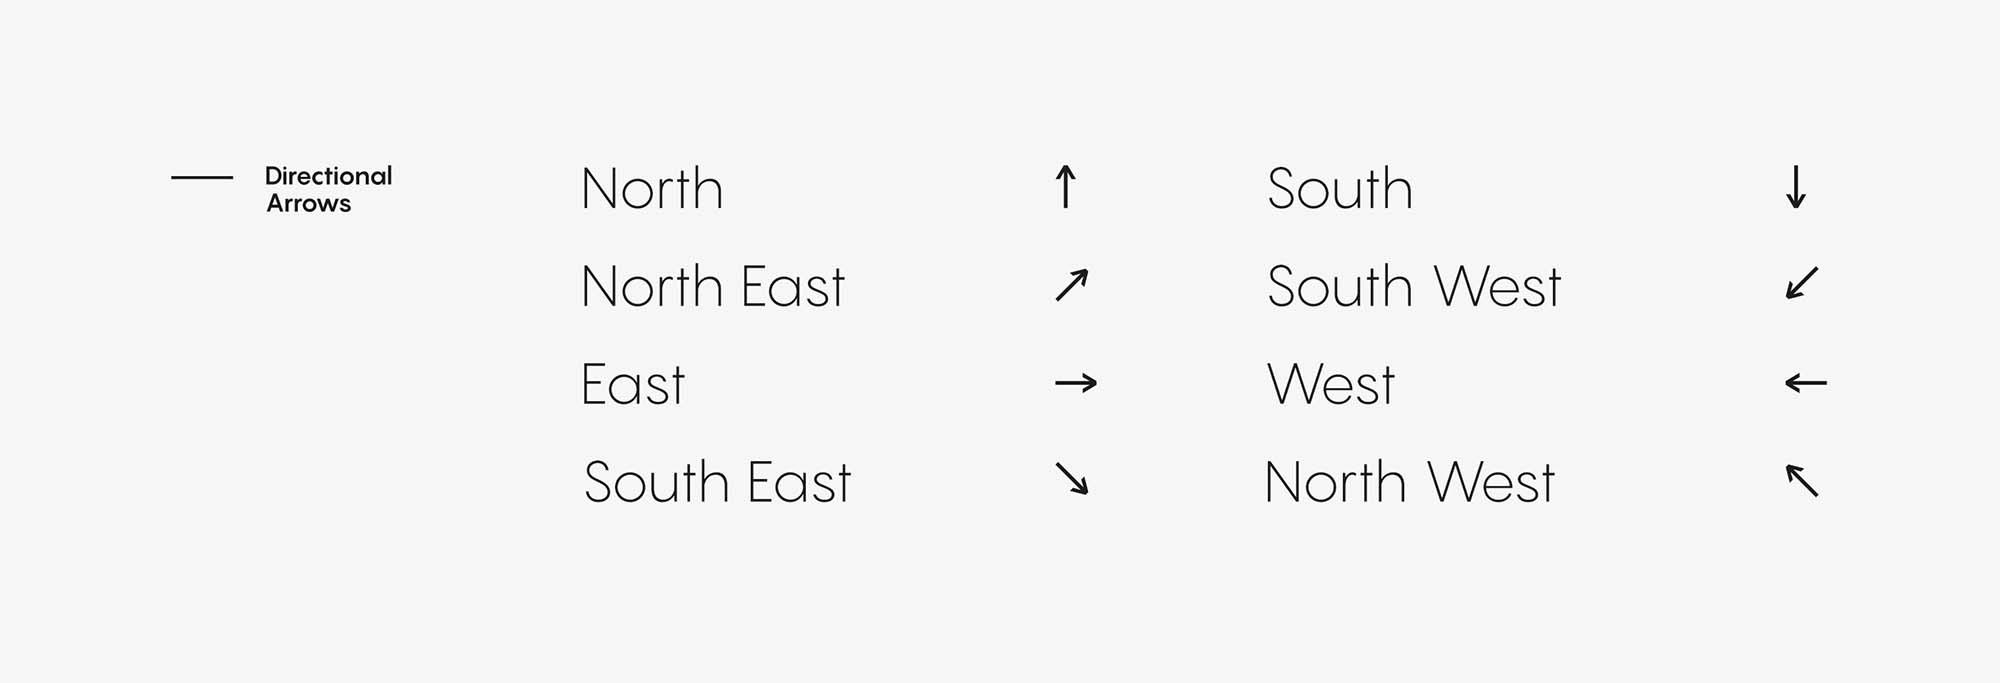 Pangram Sans Font Arrows